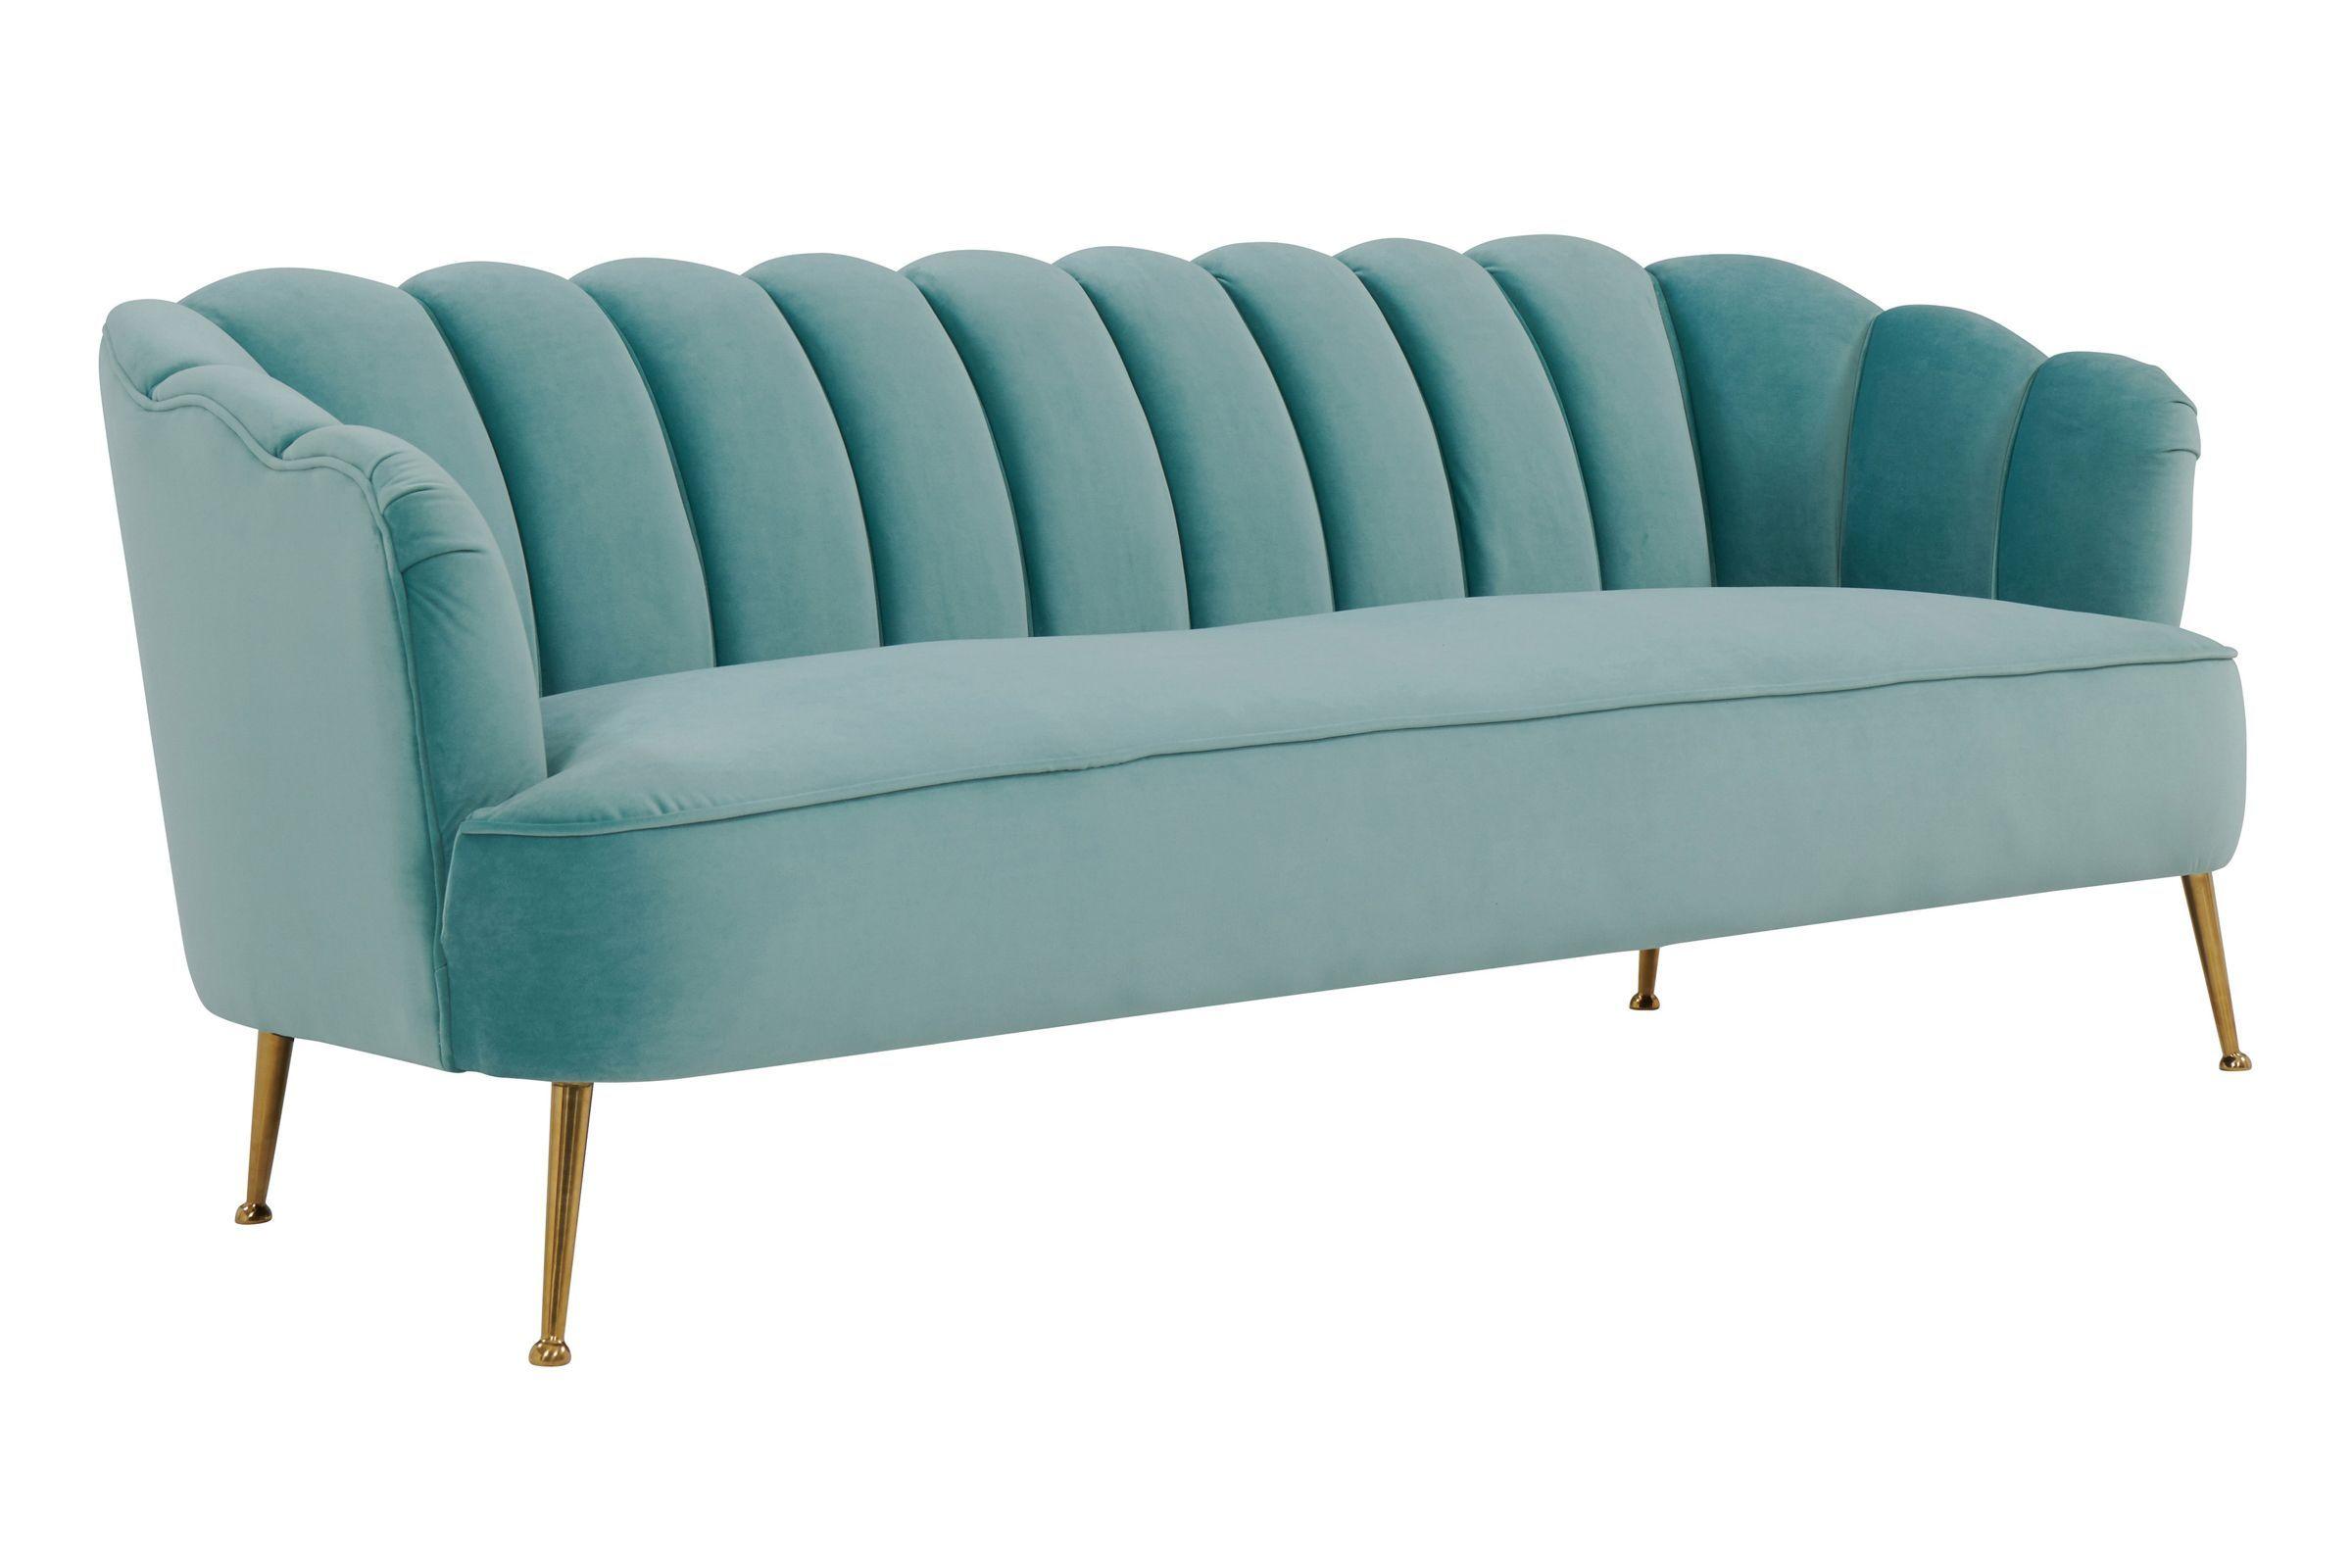 Daisy Petite Sea Blue Velvet Sofa By Tov In 2020 Blue Velvet Sofa Velvet Sofa Set Navy Blue Velvet Sofa